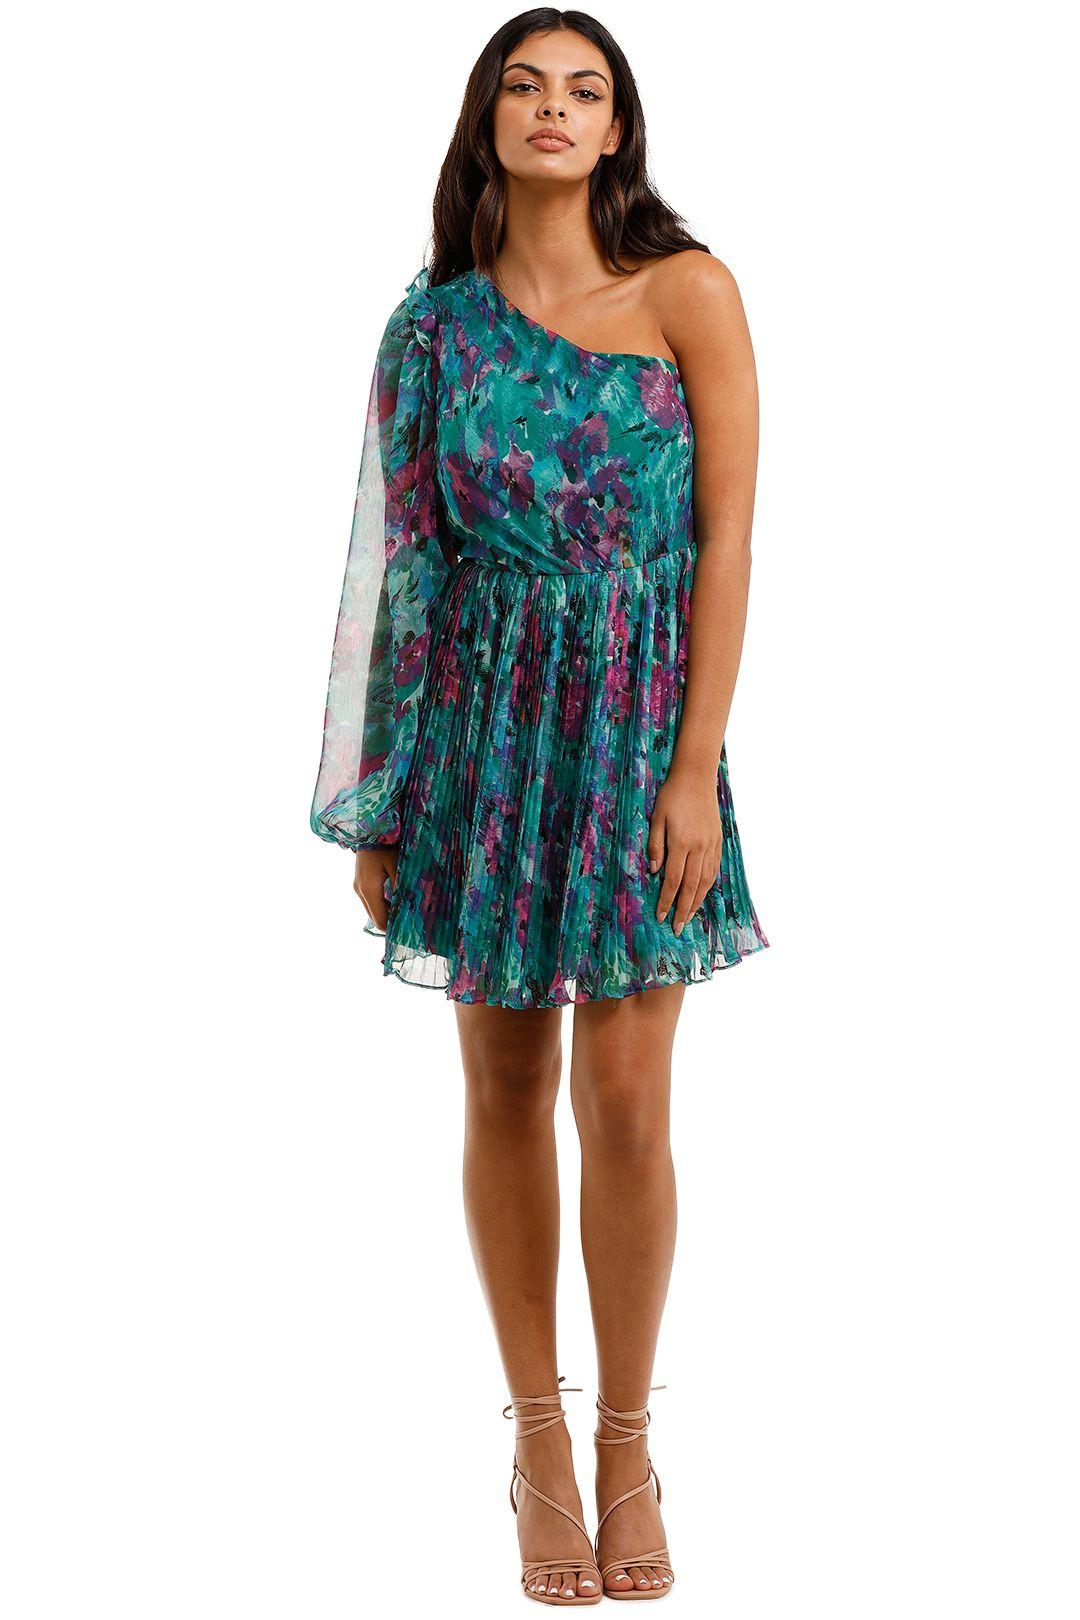 Talulah Barcelona Nights Mini Dress Watercolour Floral Print Mini